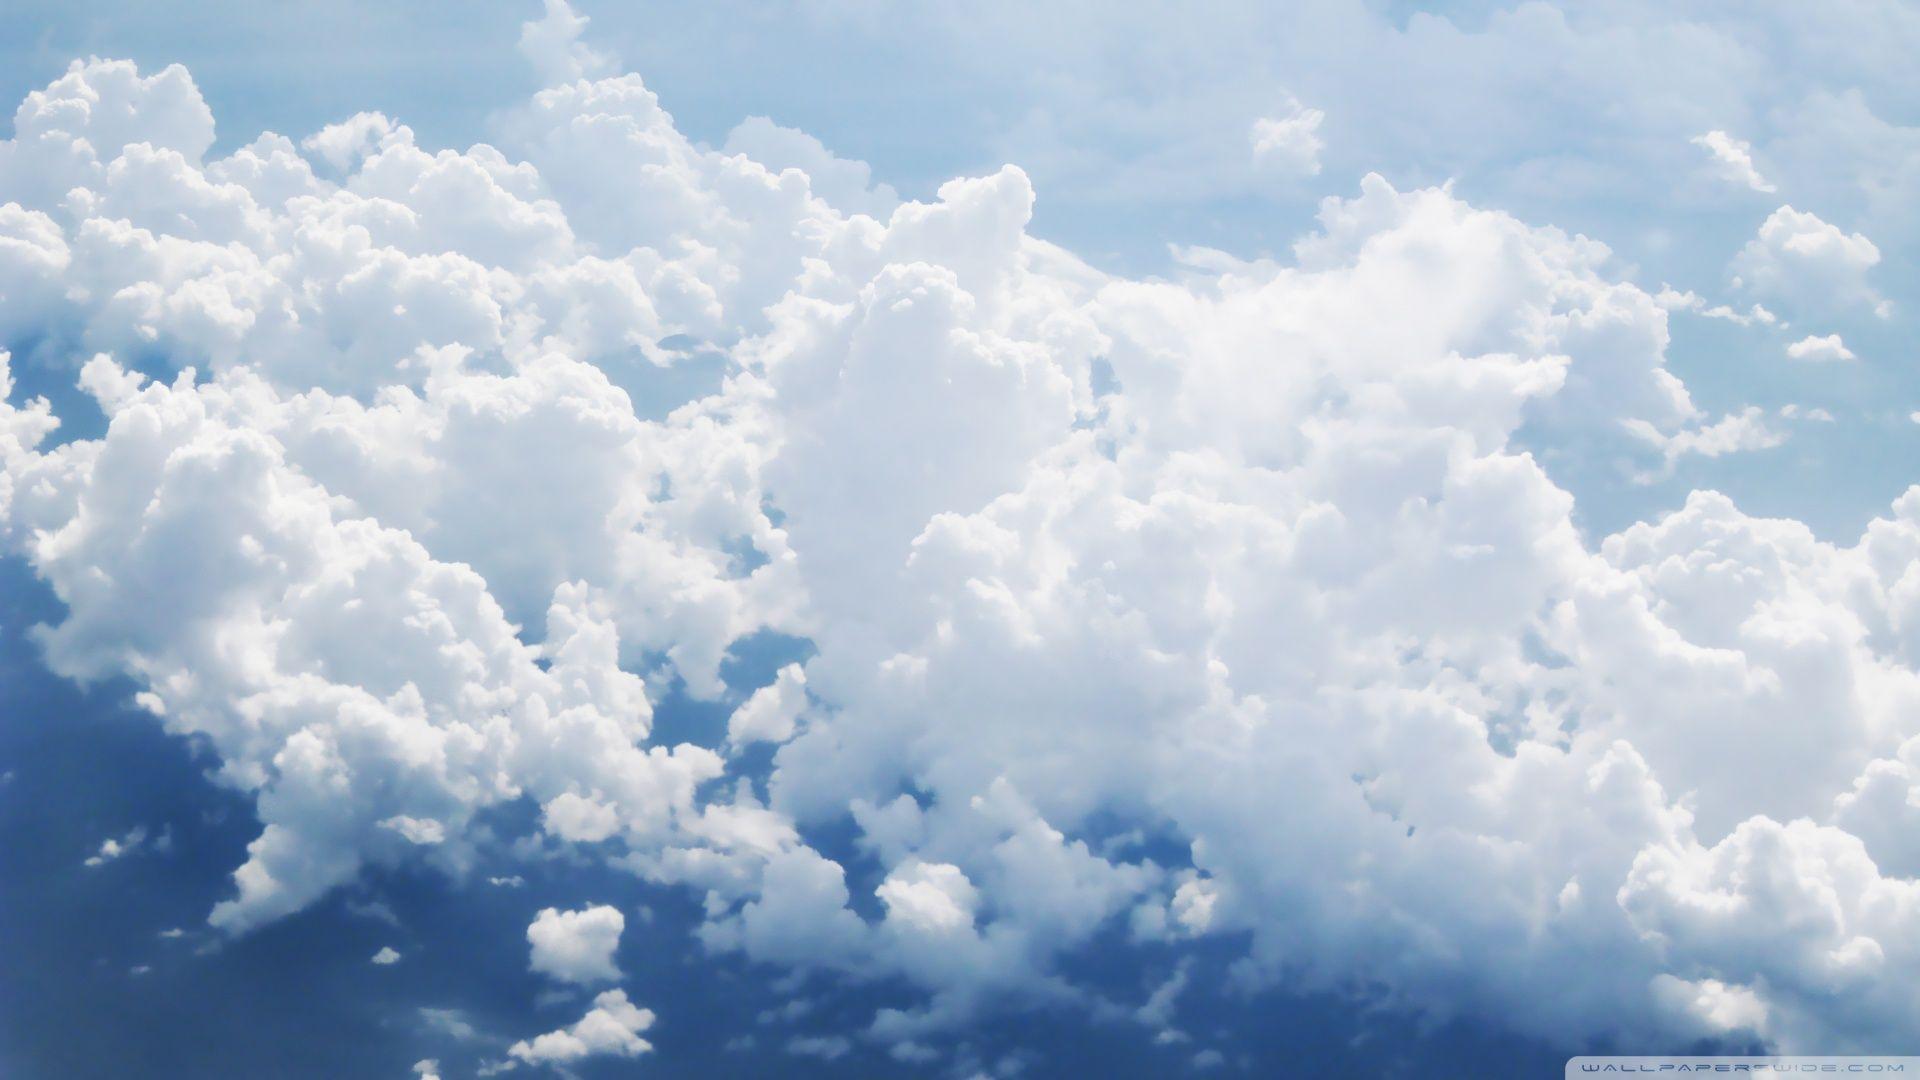 clouds Clouds Aerial View Wallpaper 1920x1080 Clouds